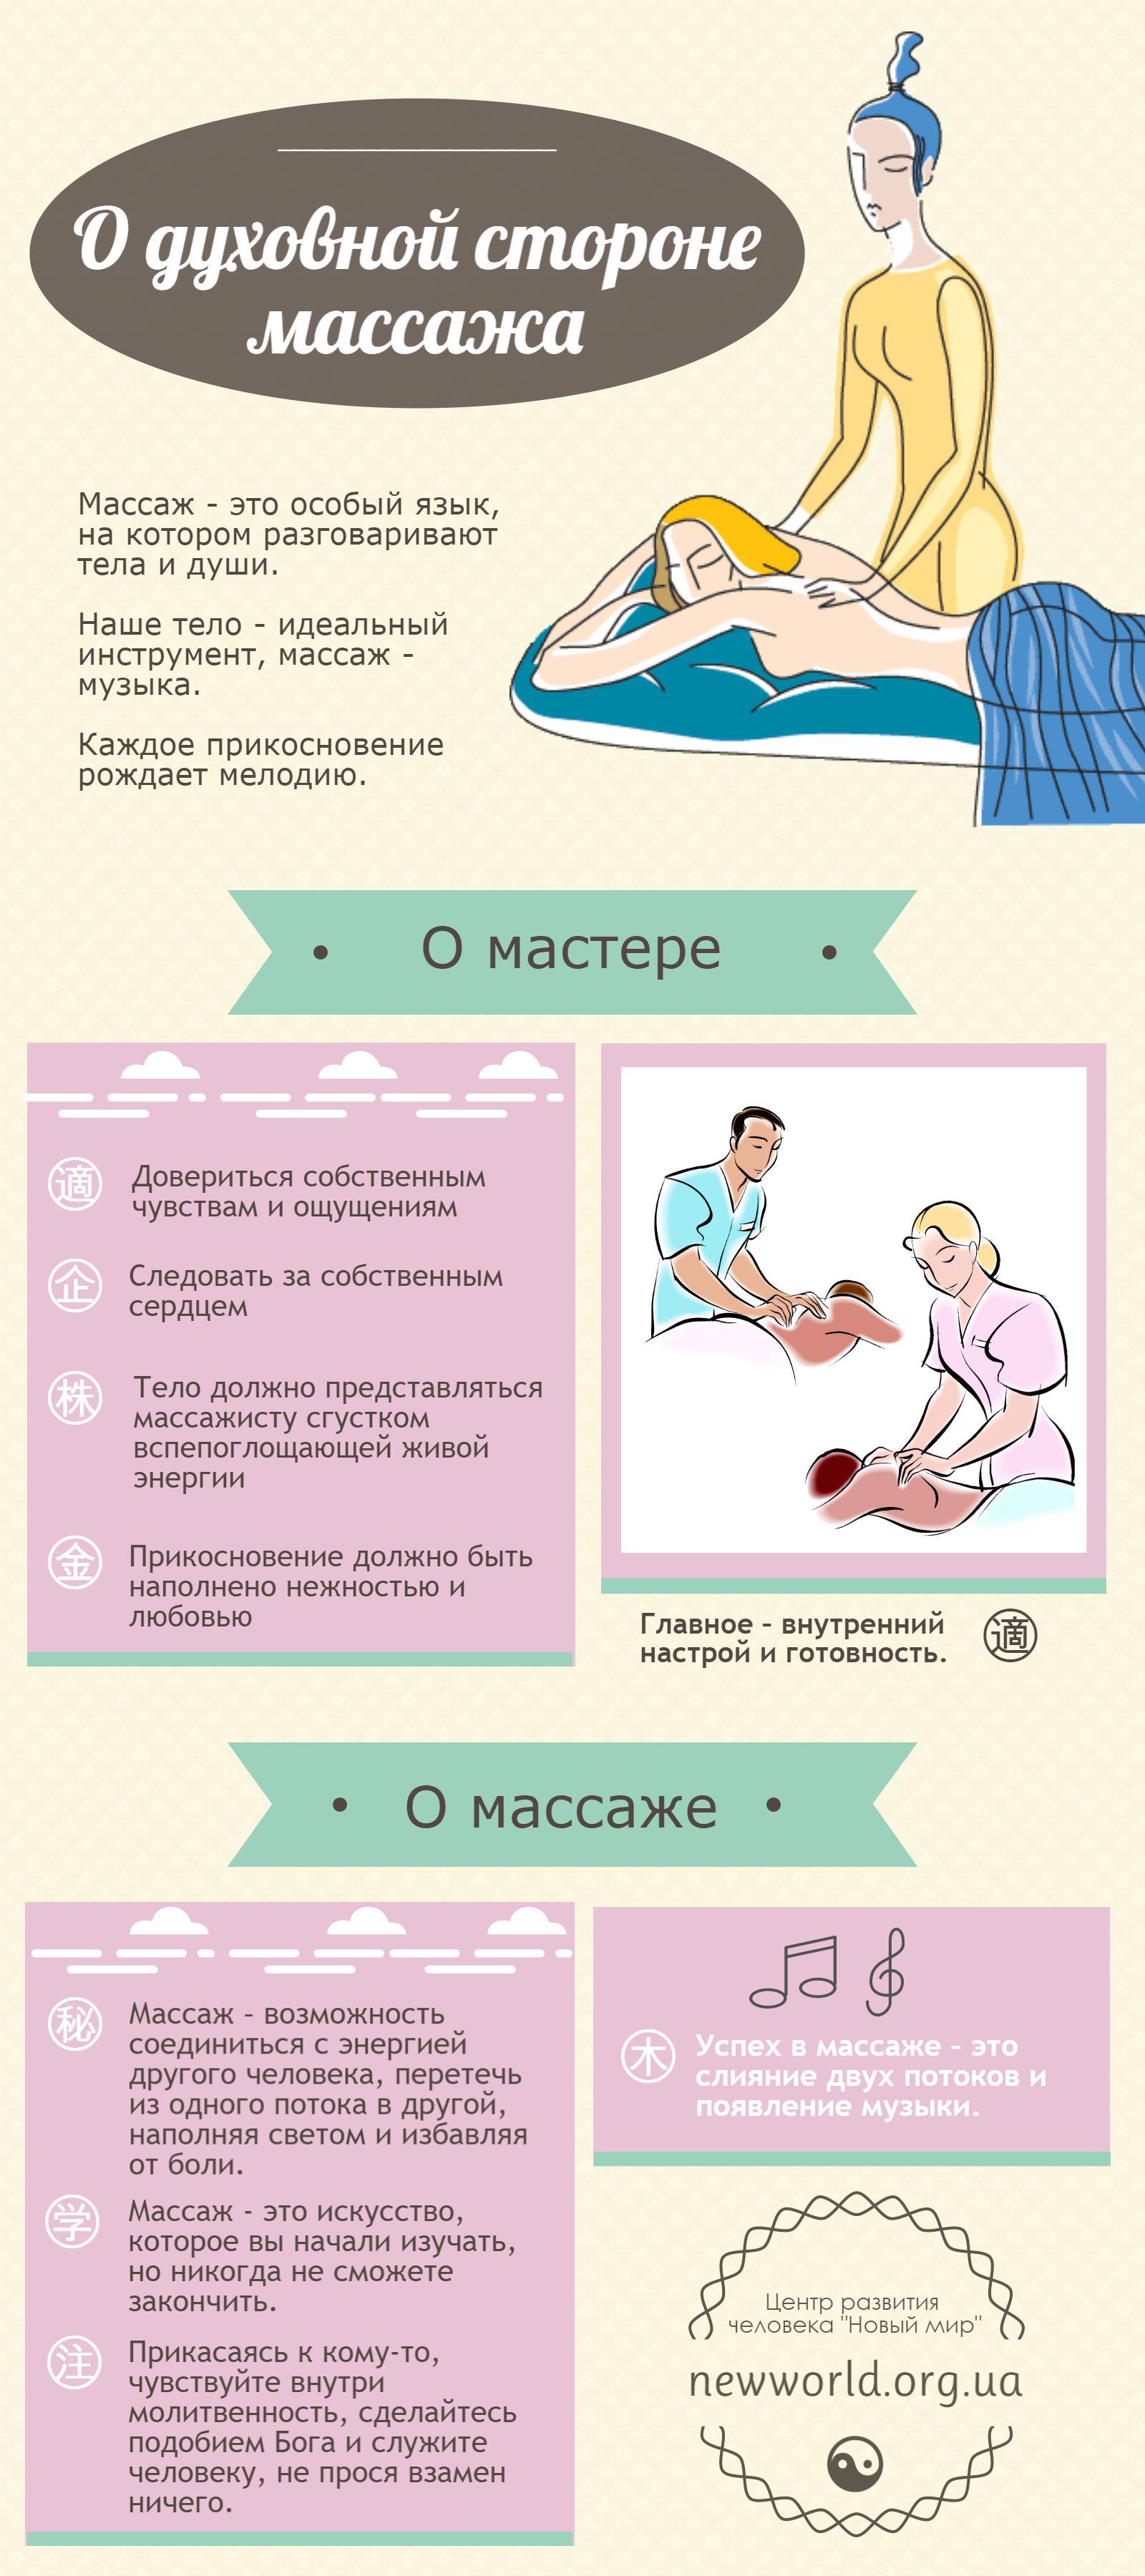 duhovnaoi storona massaga